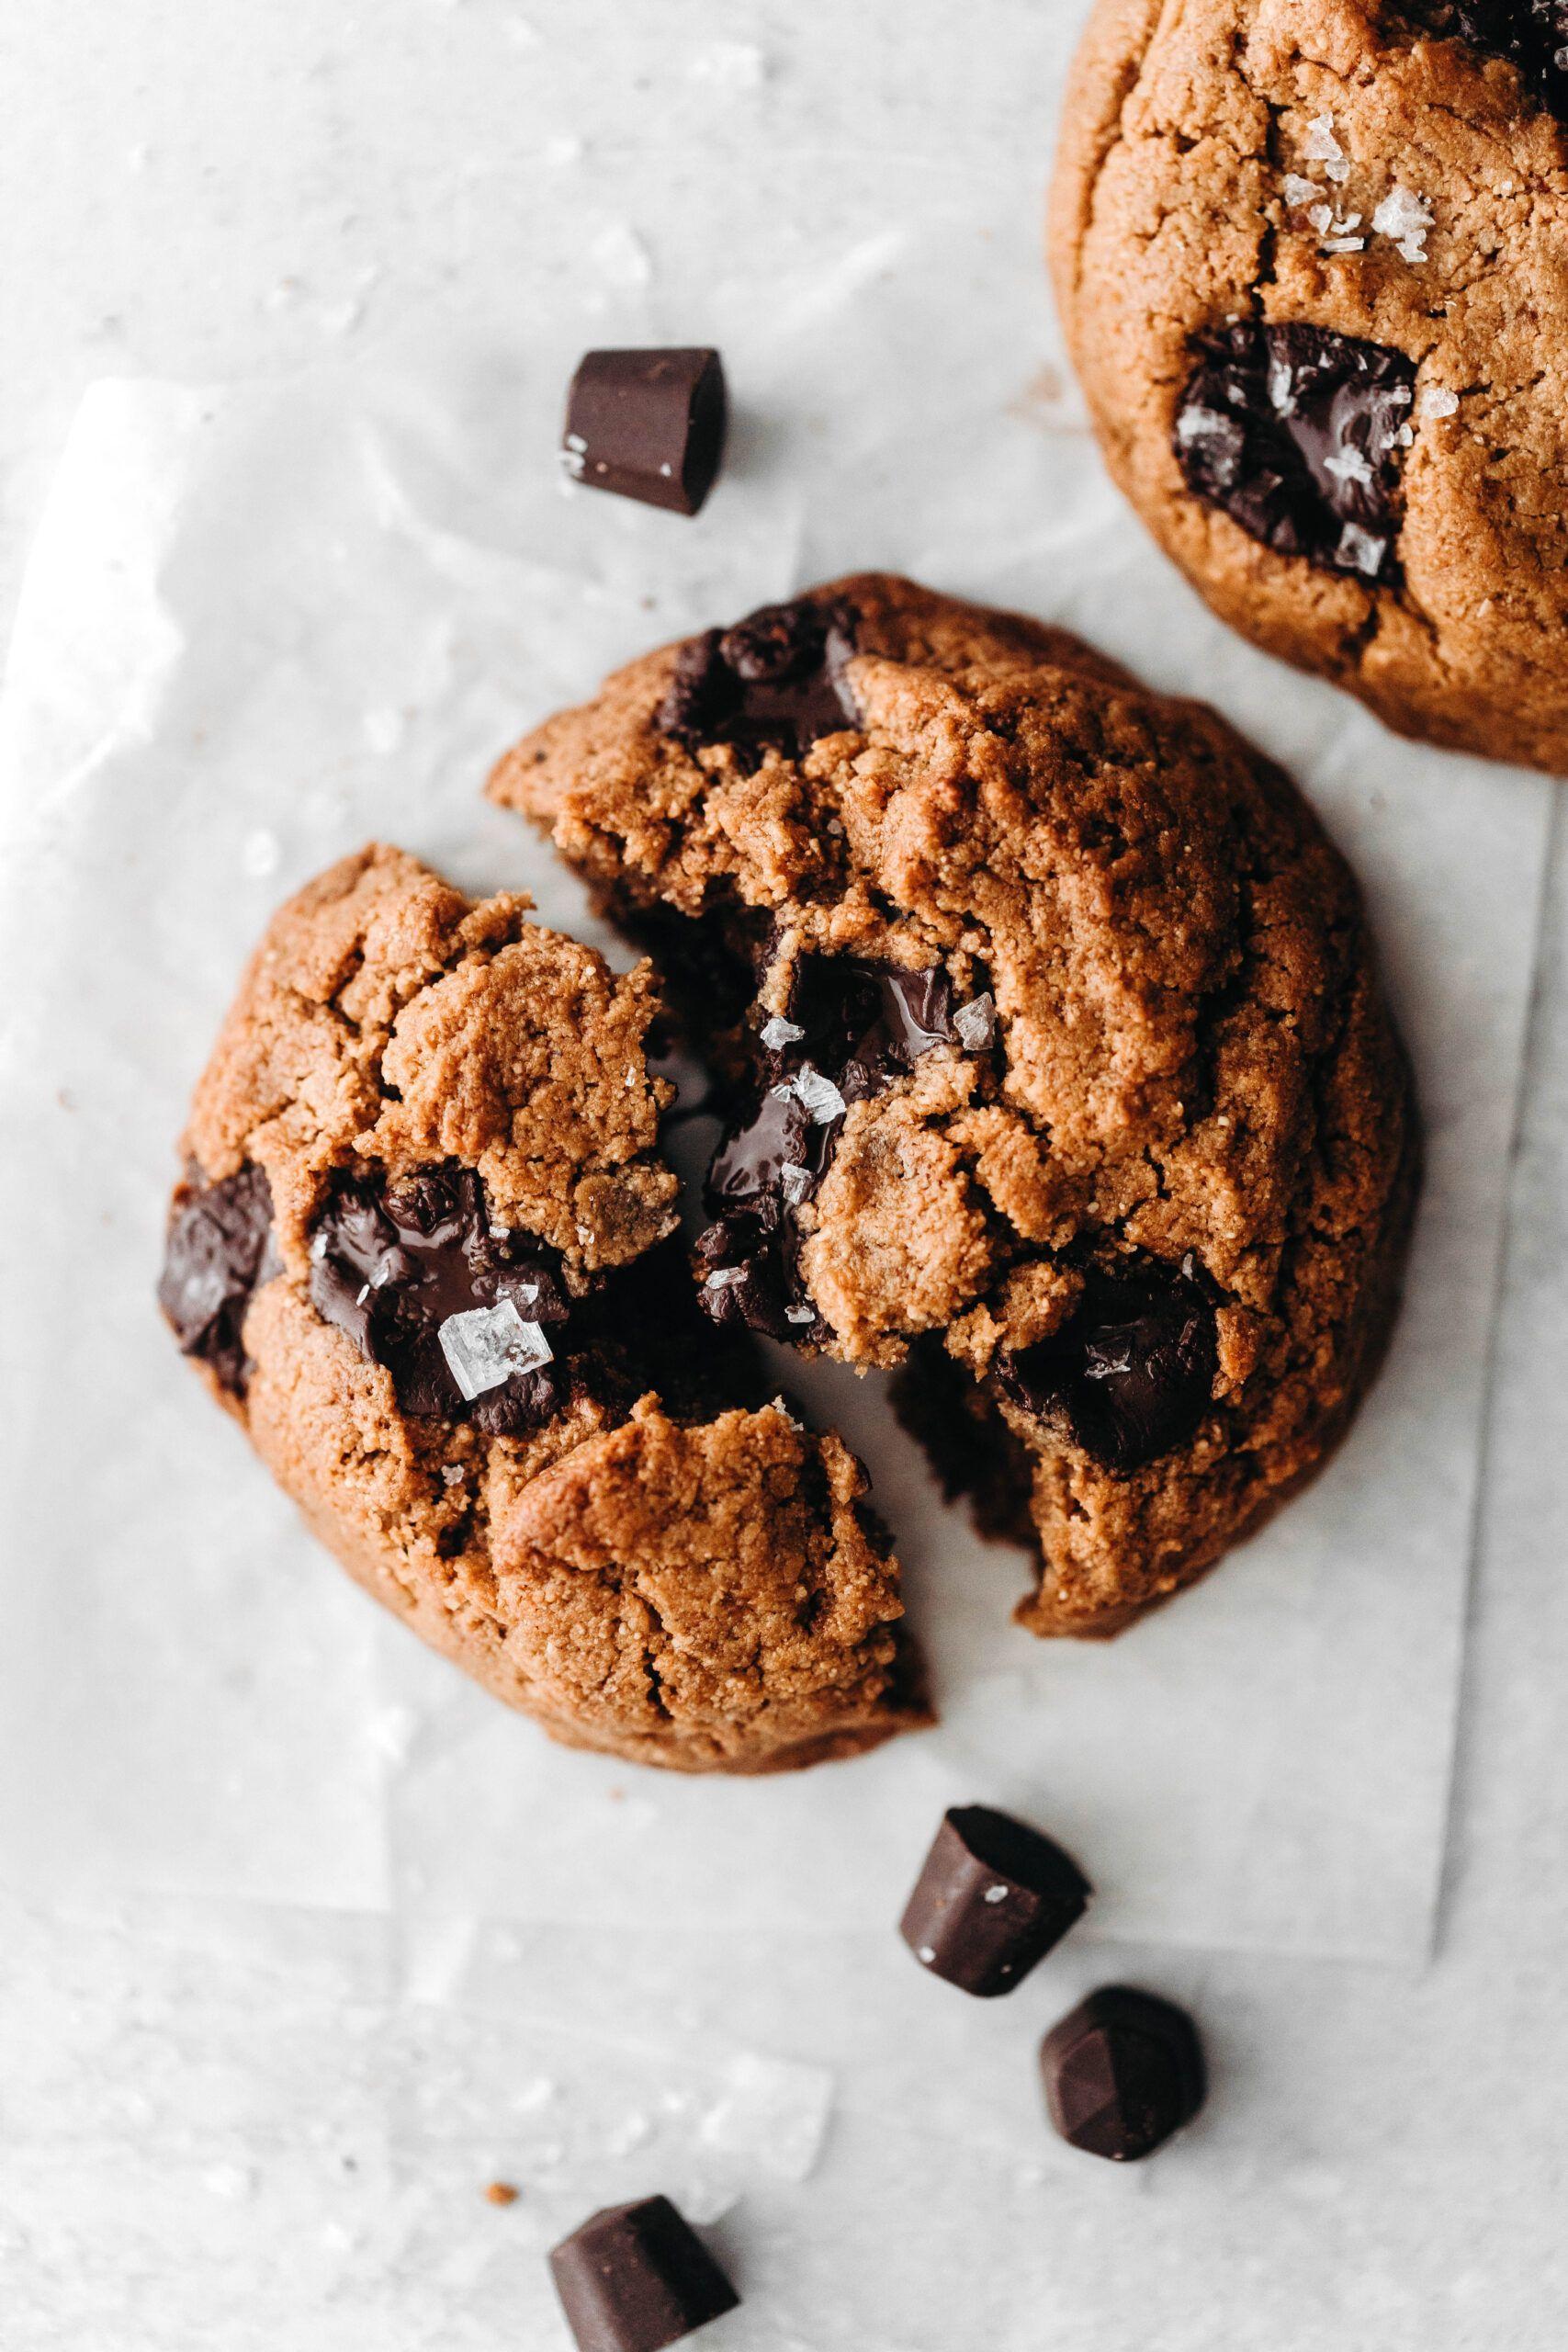 Thick Chewy Chocolate Chip Cookies Vegan Paleo Recipe Chewy Chocolate Chip Cookies Crispy Chocolate Chip Cookies Healthy Cookie Recipes